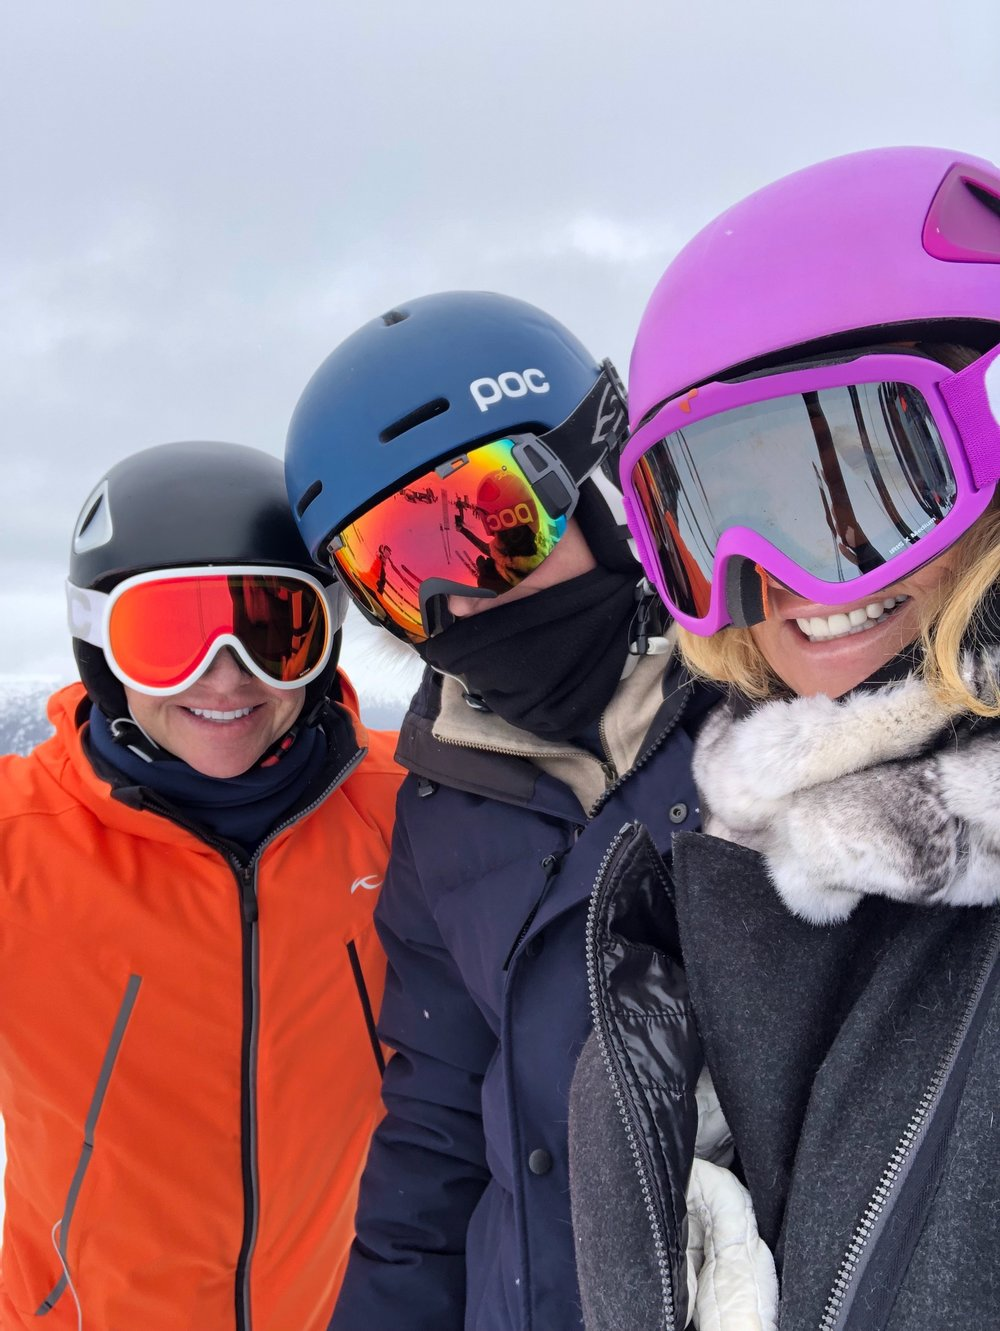 Kjus  /  Canada Goose  / Frauenschuh /  Poc  Helmet